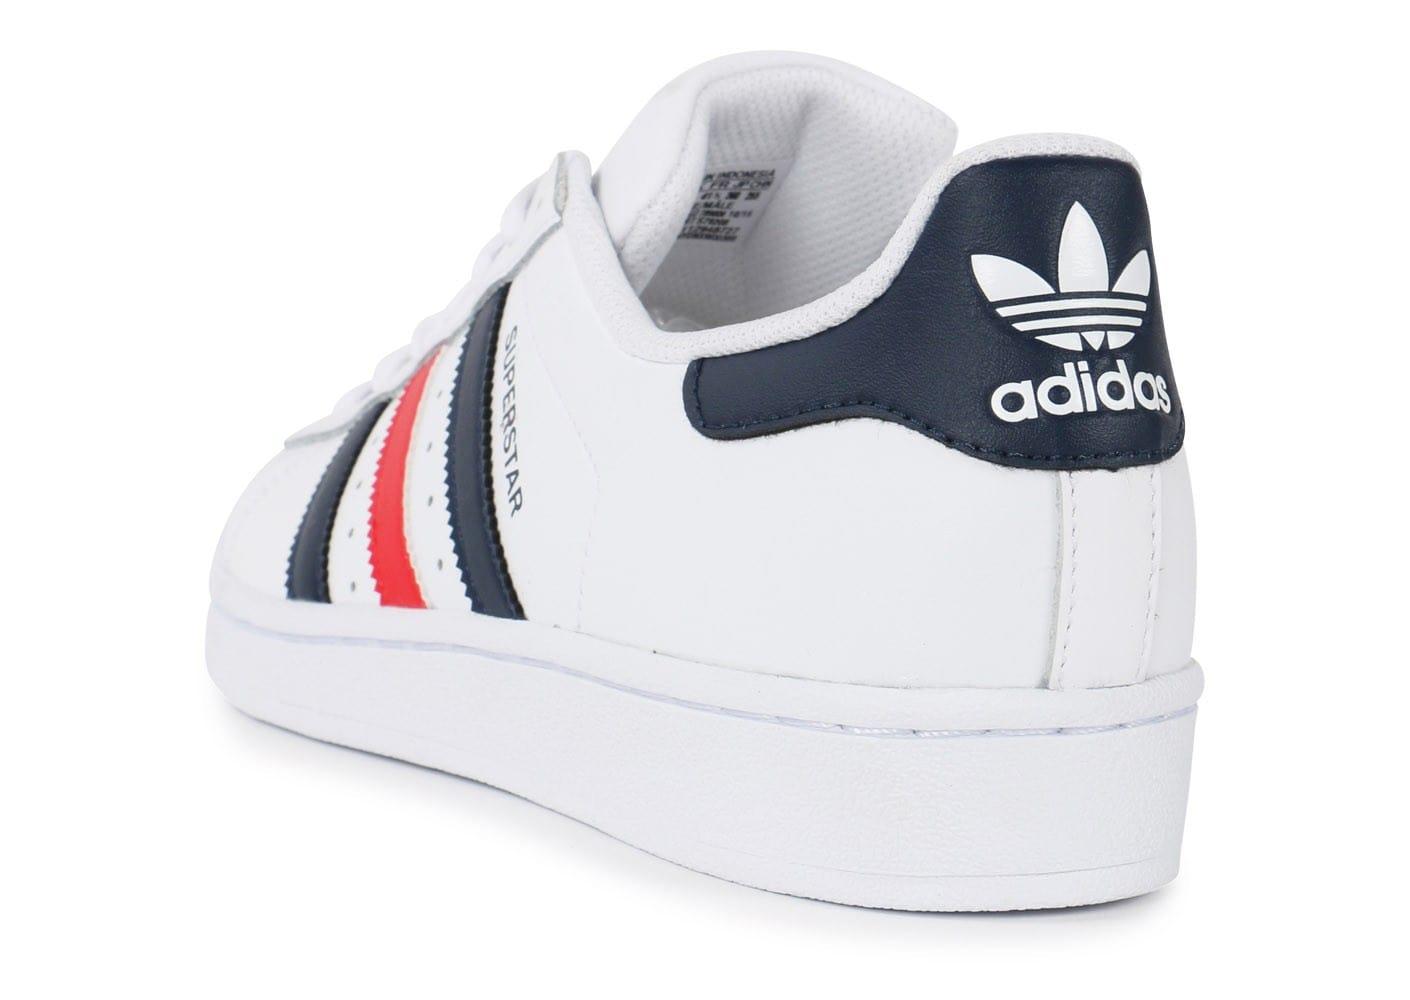 adidas superstar homme rouge et blanche